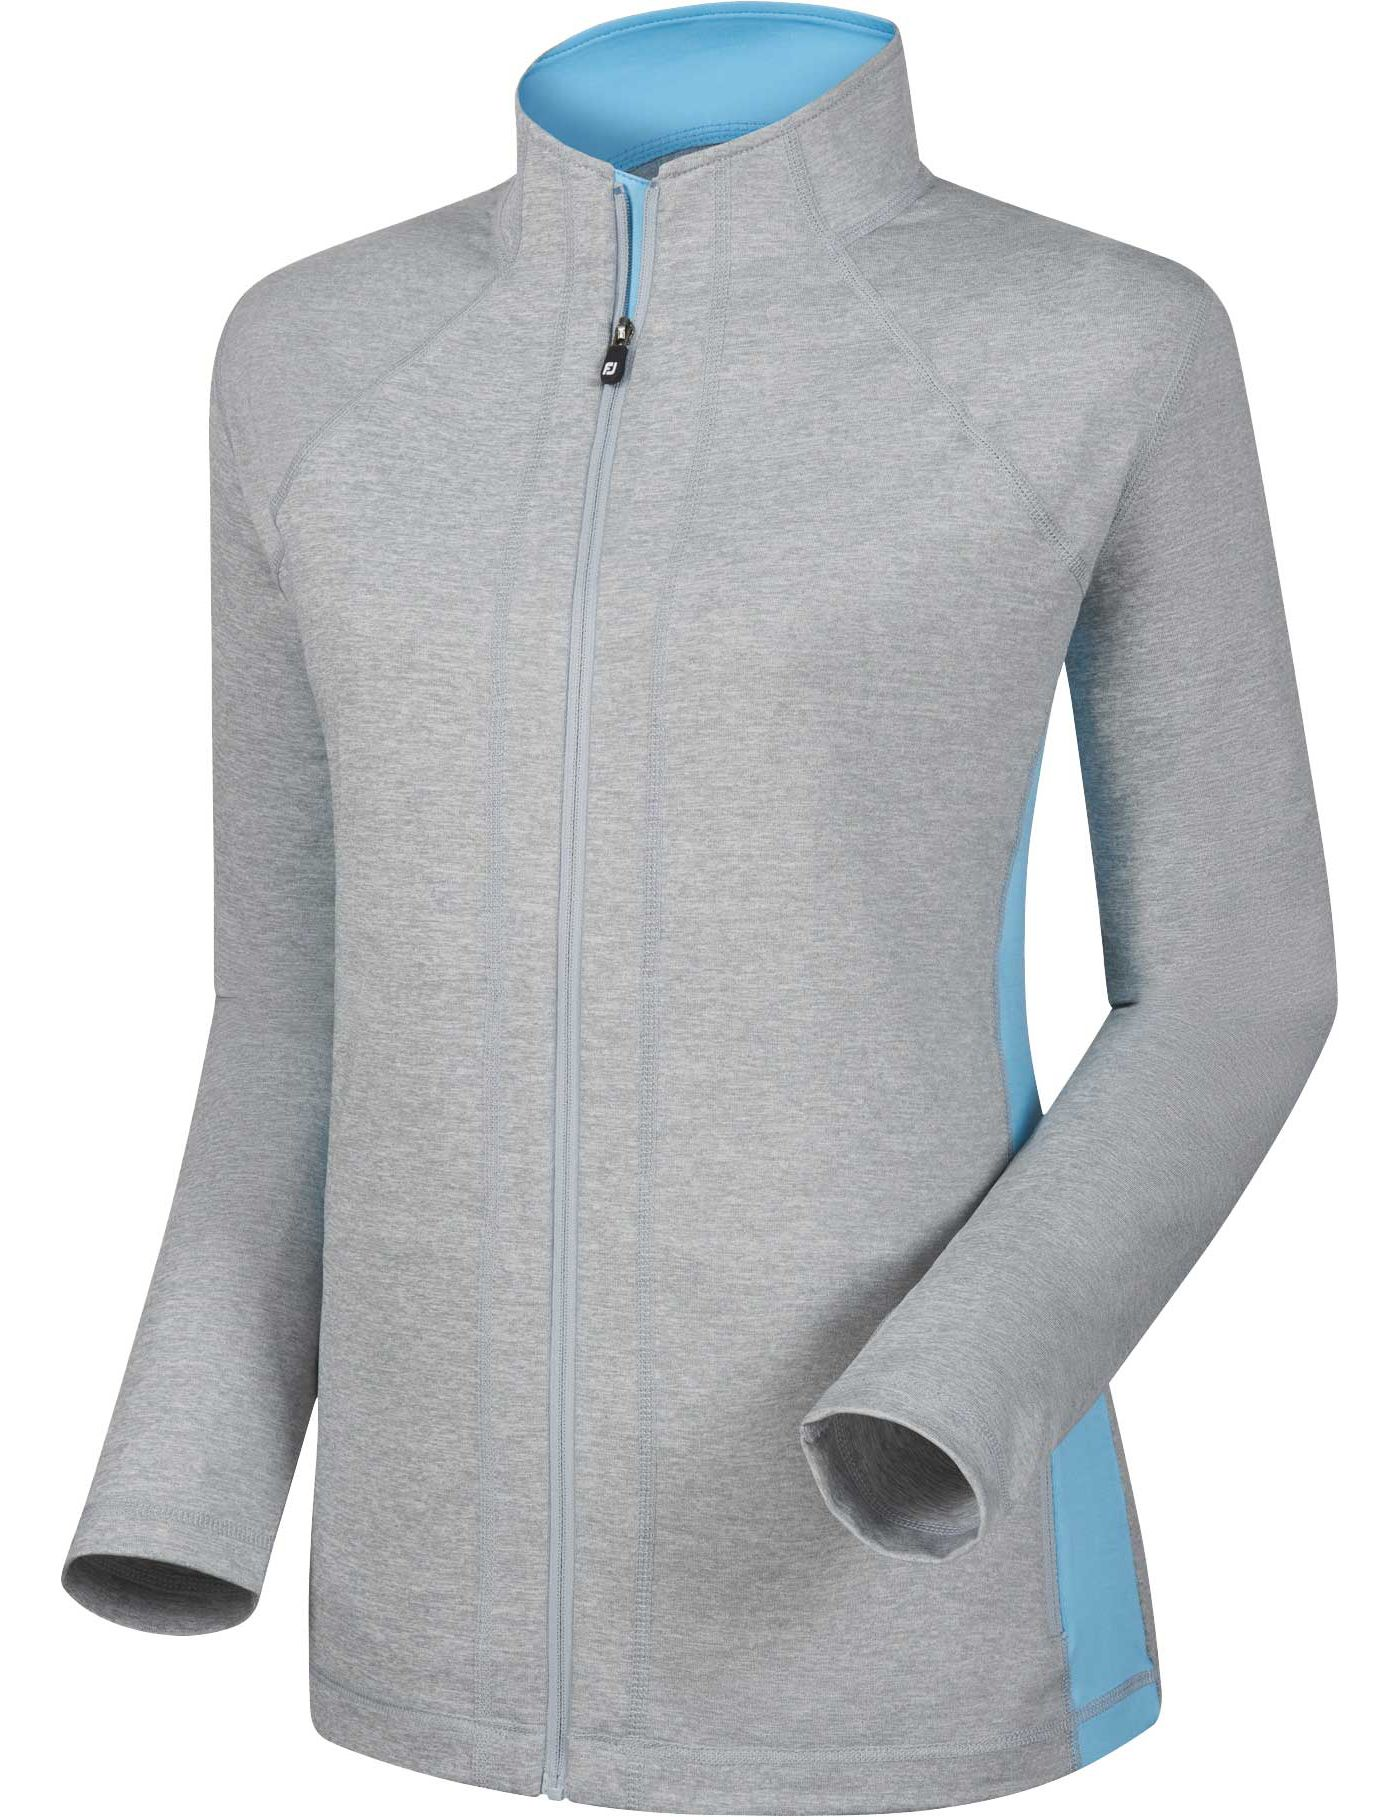 FootJoy Women's Full-Zip Performance Mid Layer Golf Jacket